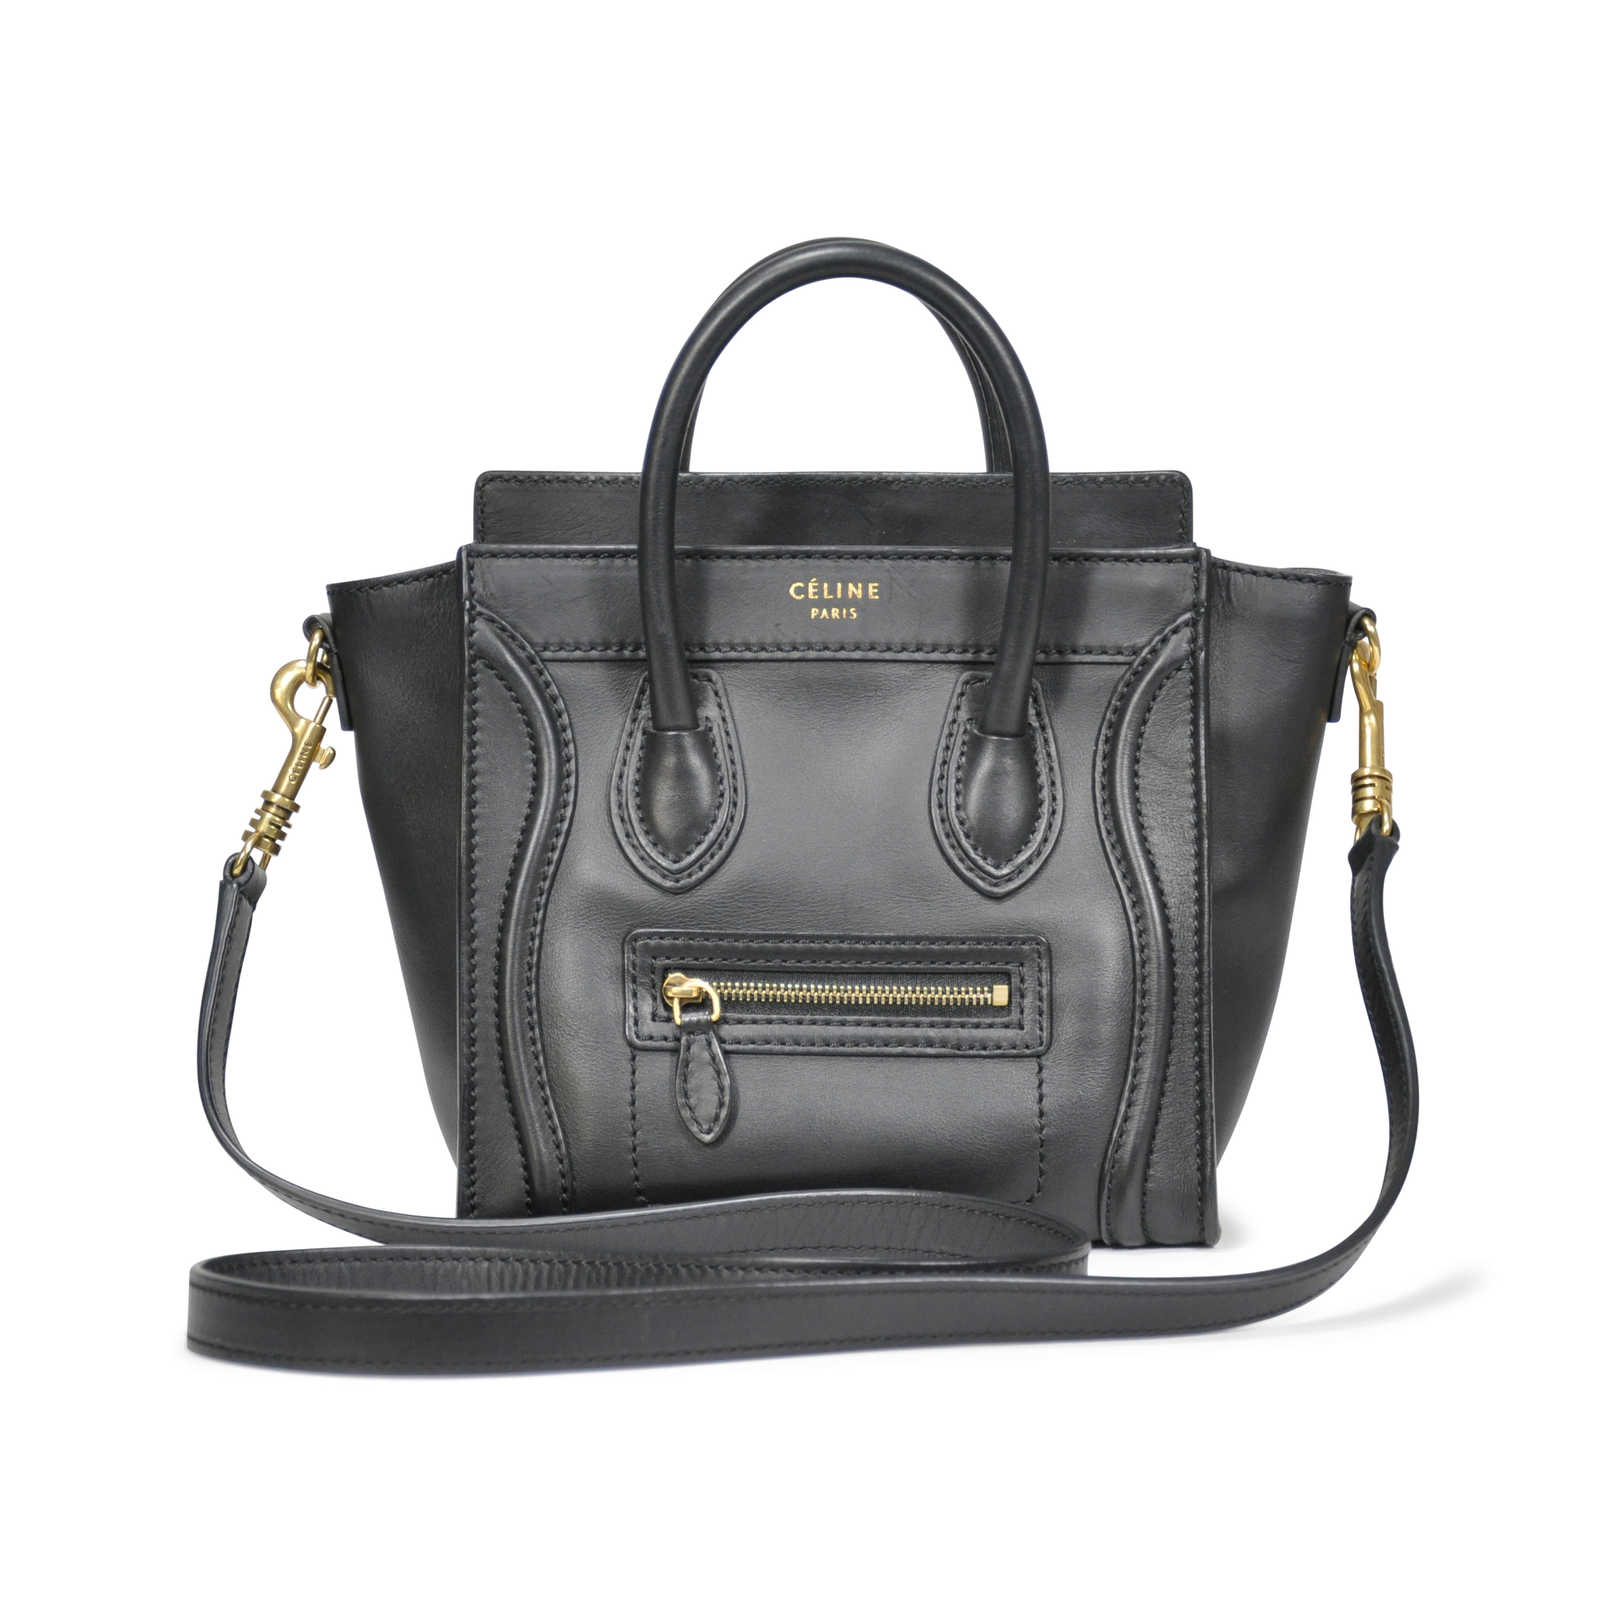 celine-nano-luggage-bag-pss-183-00038-1.jpg